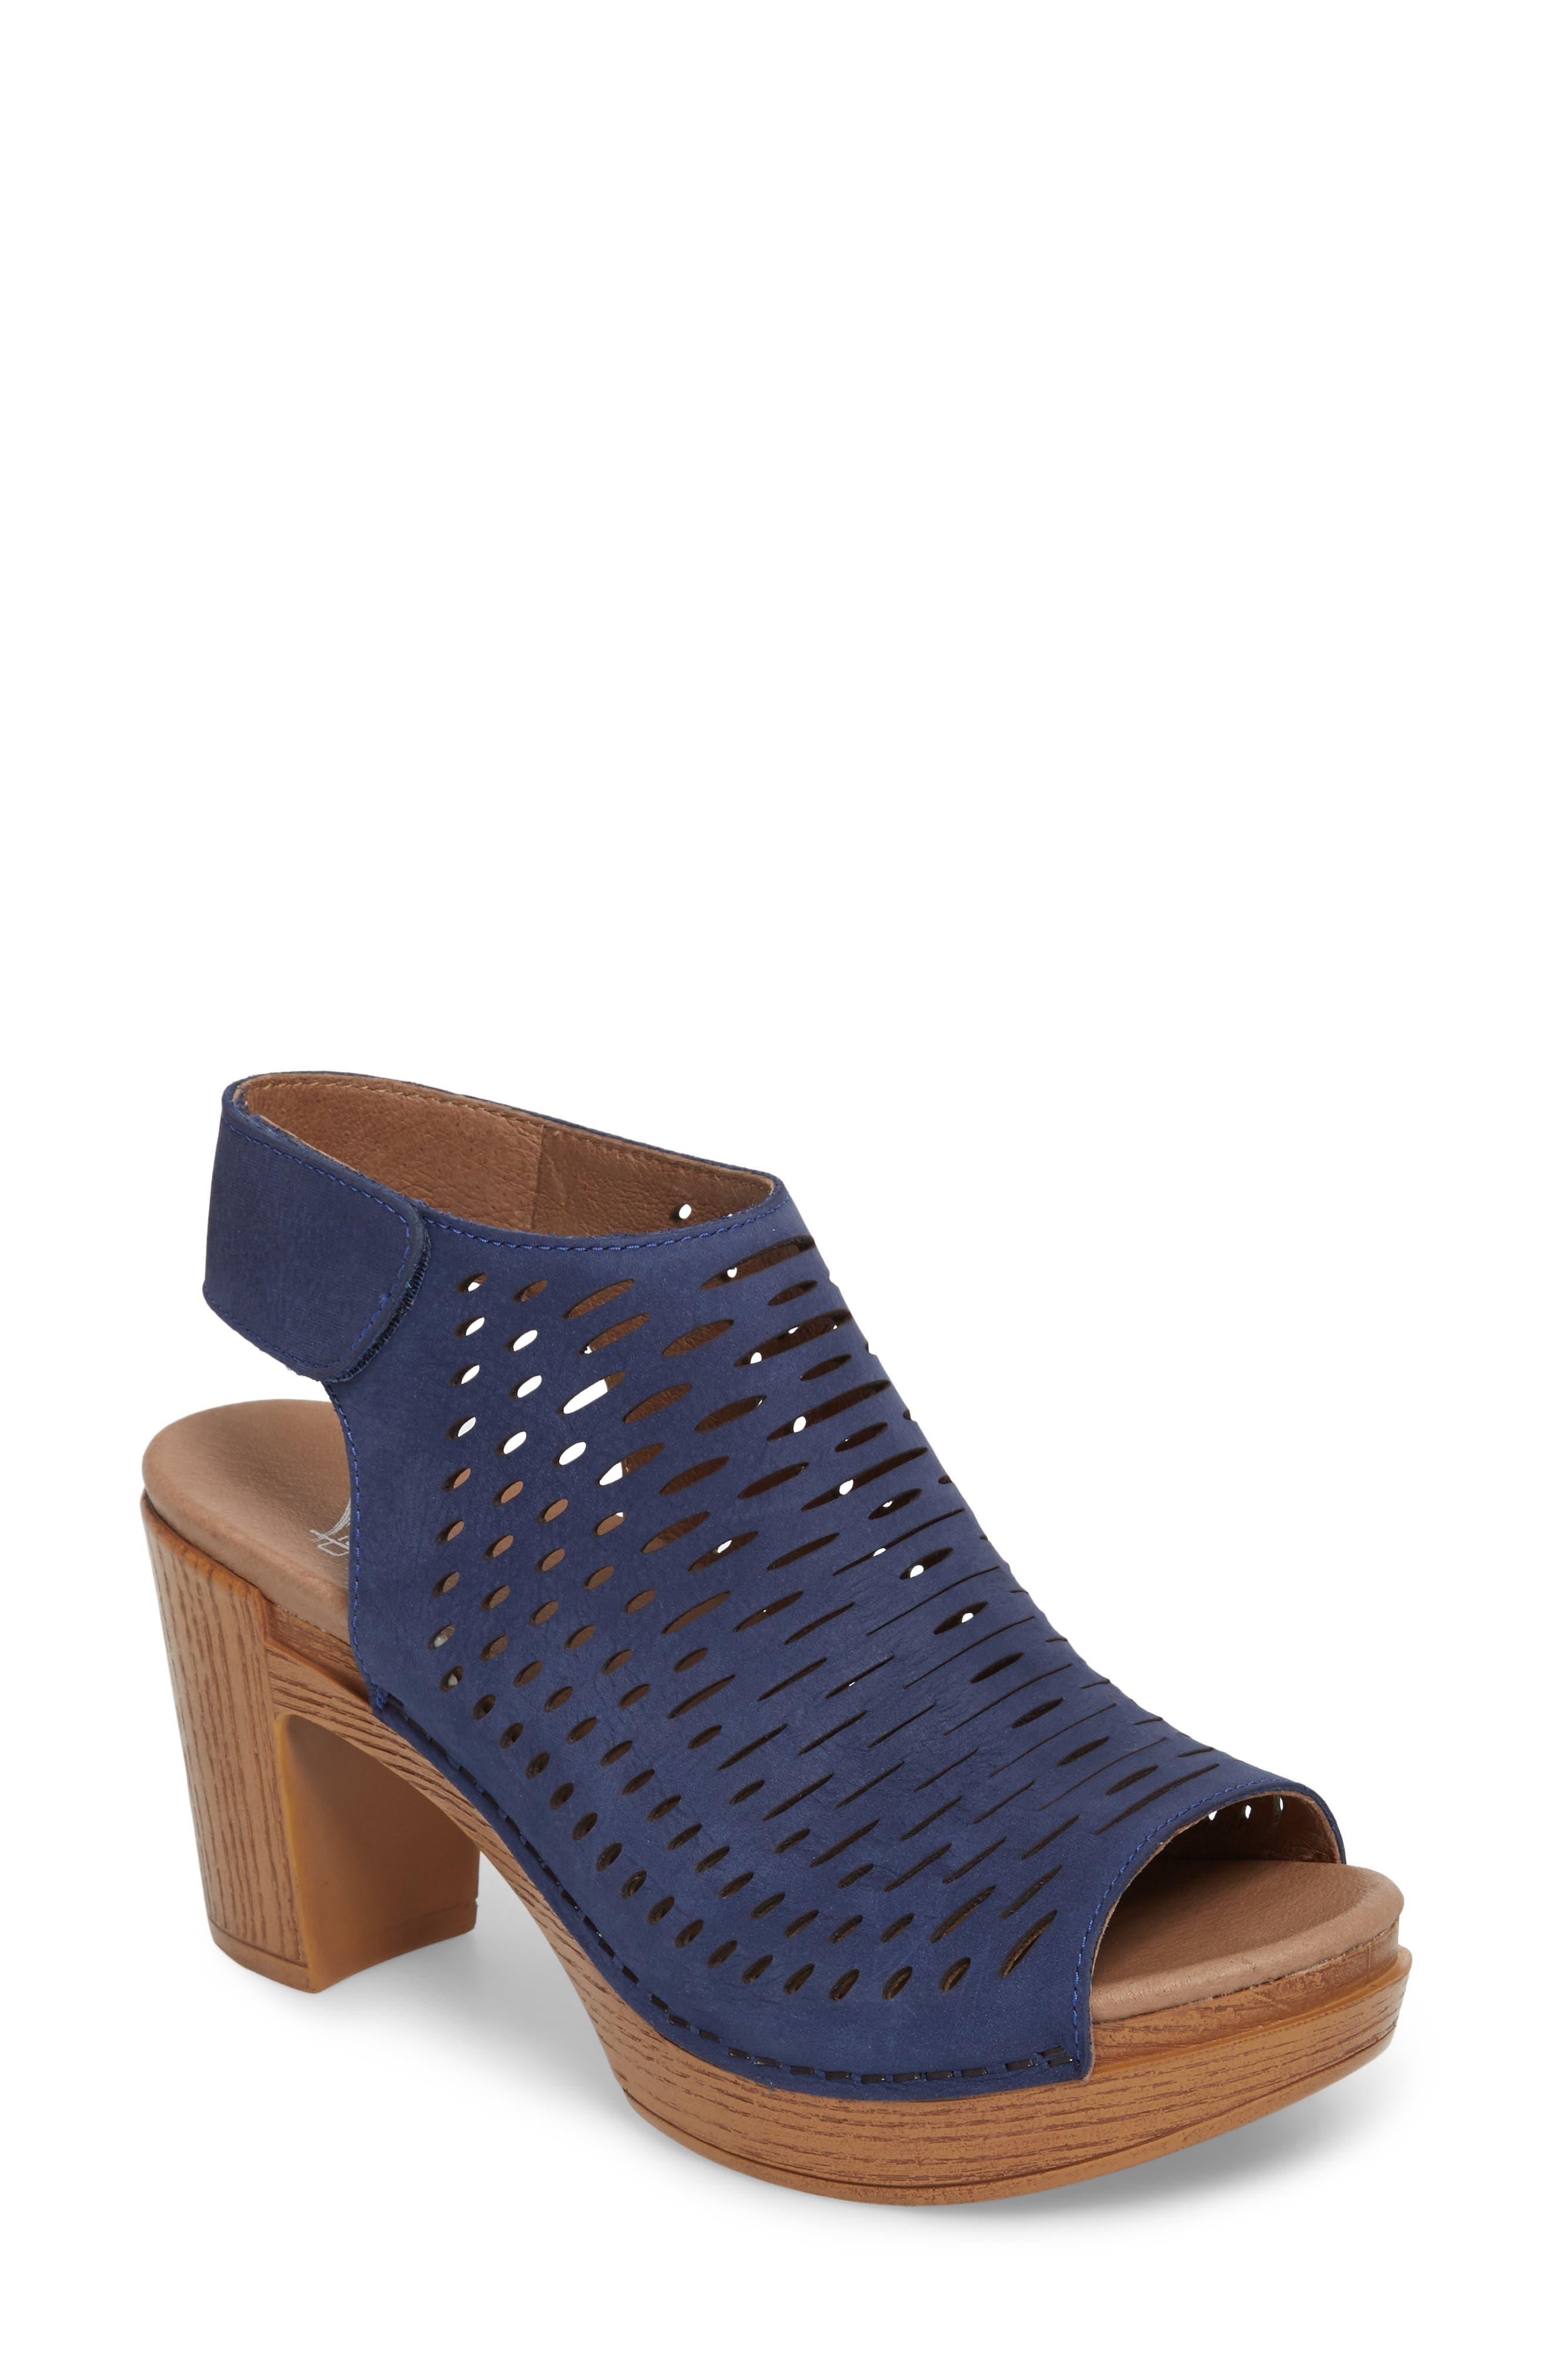 Danae Block Heel Sandal,                         Main,                         color, Blue Milled Nubuck Leather